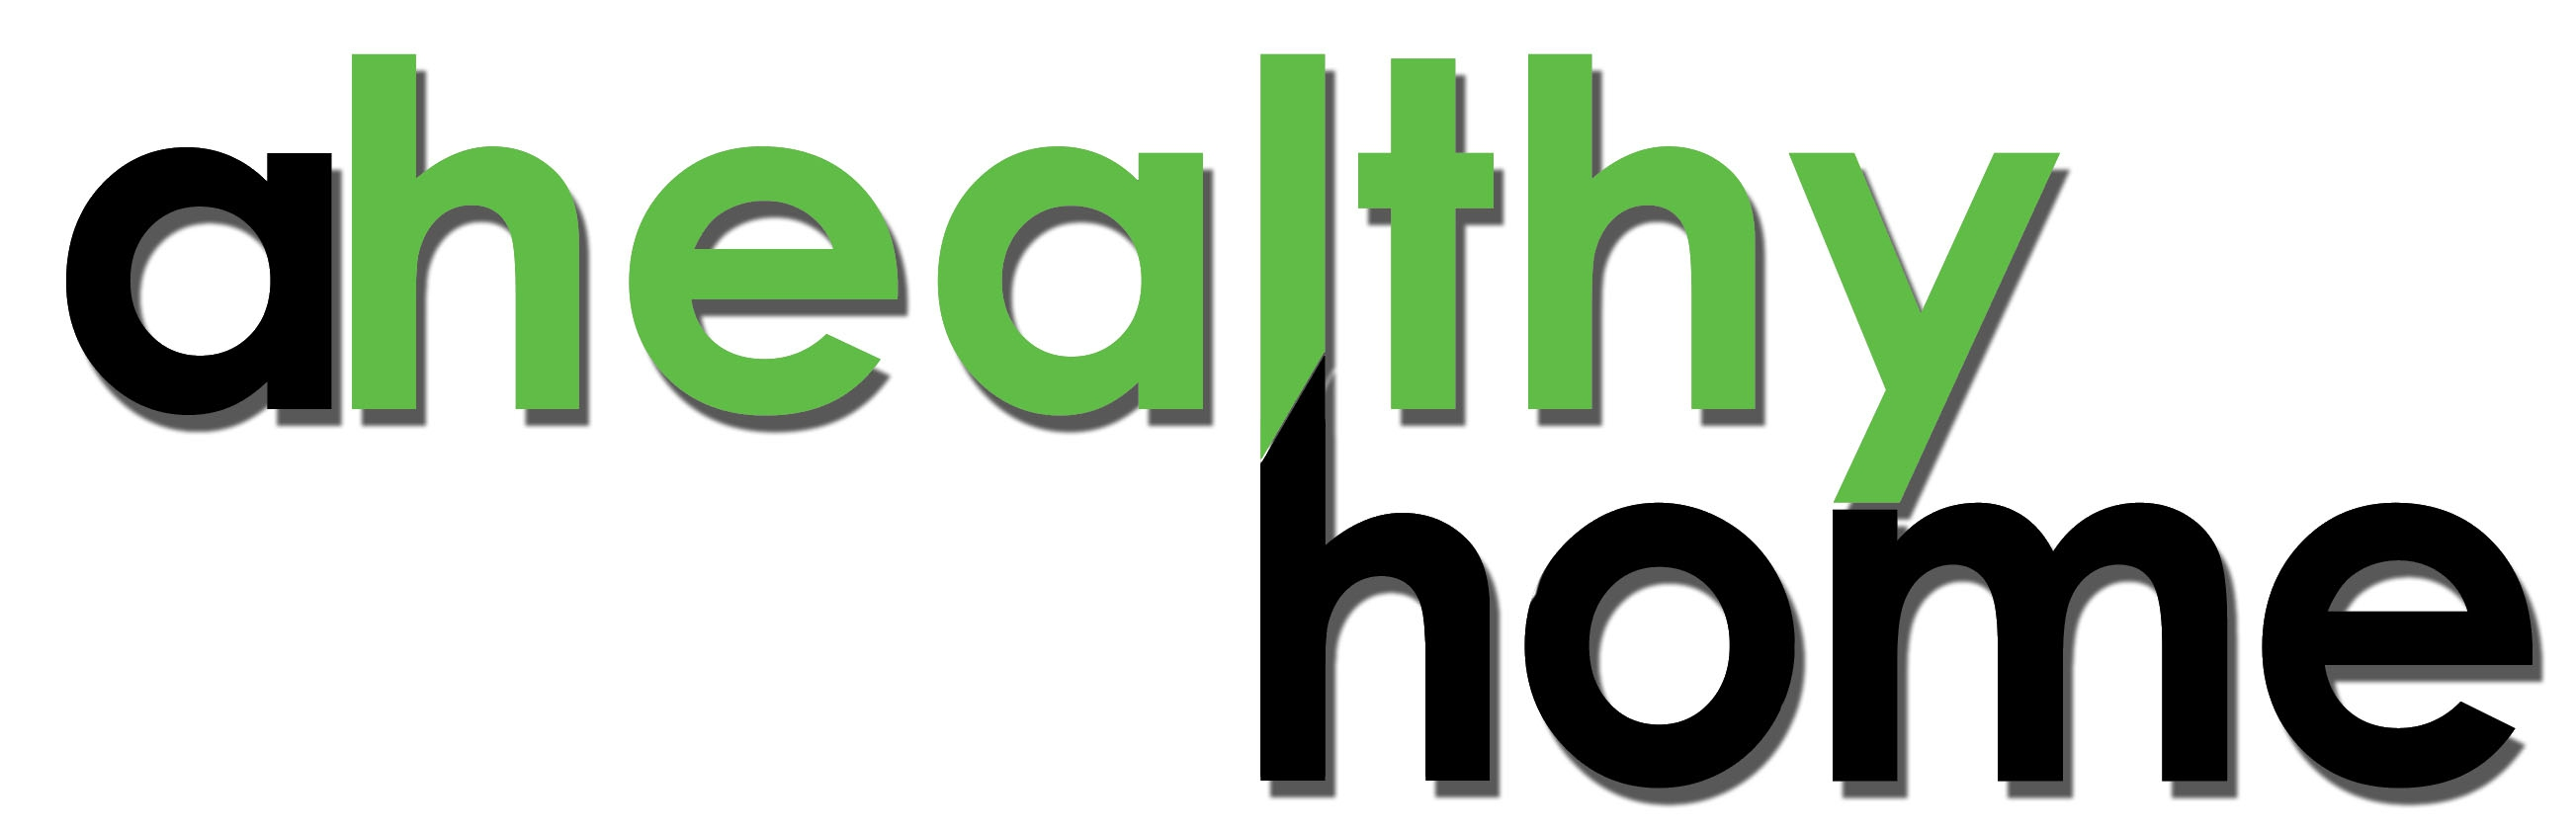 A Heathy Home | Cashiers | Highlands